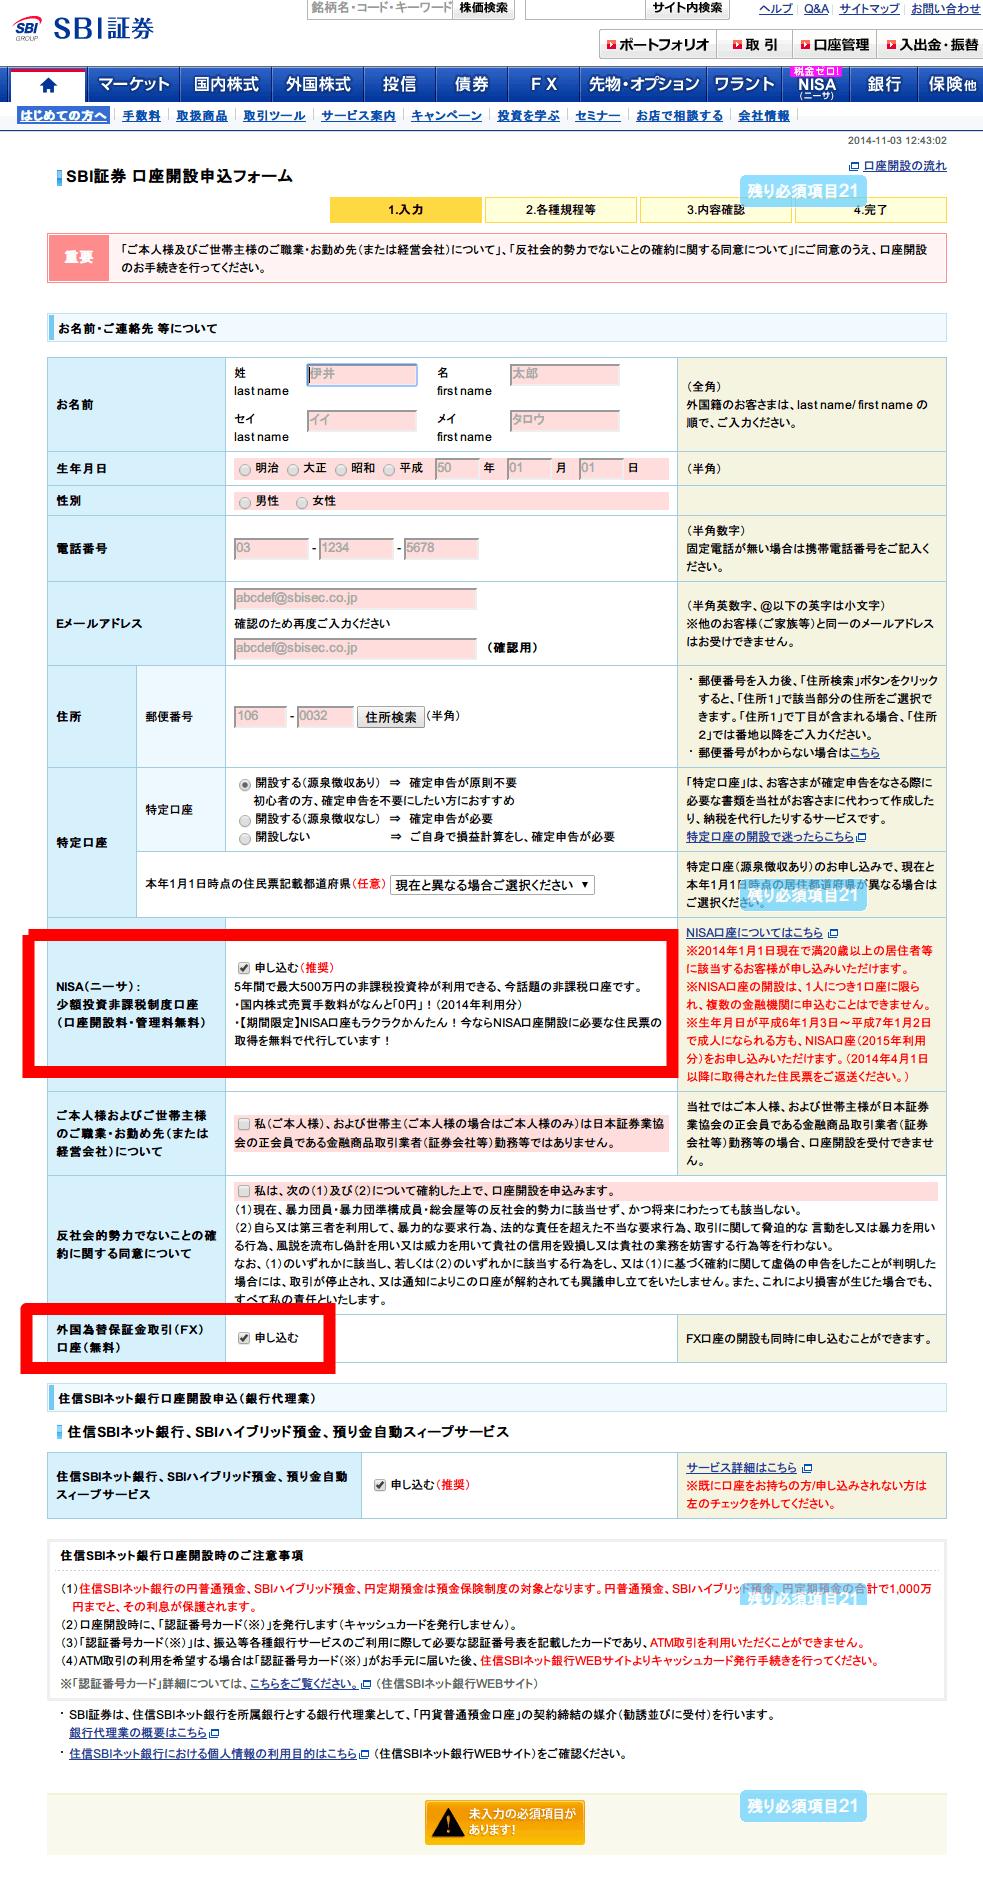 SBI証券の口座開設画面